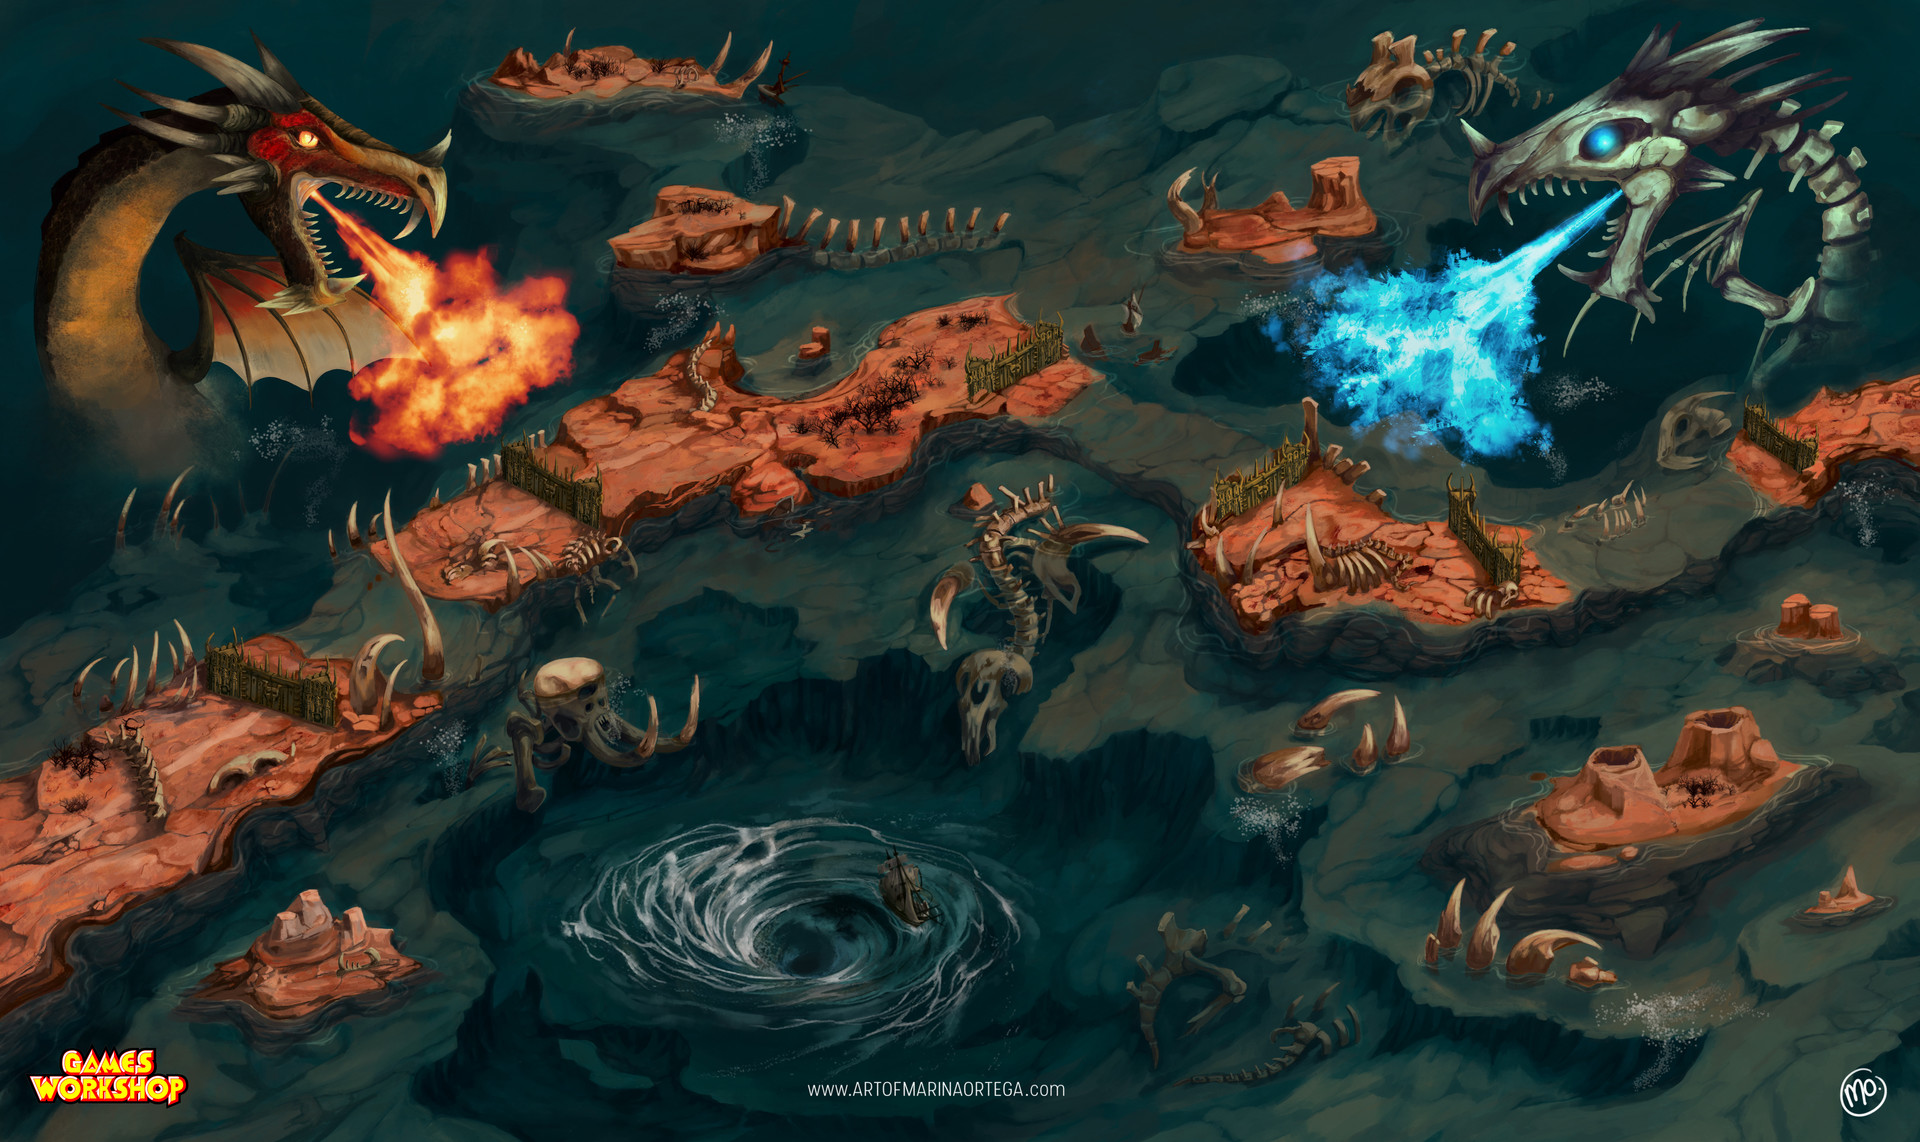 Marina ortega realm of beasts map beastclaw www artofmarinaortega com marinaortega